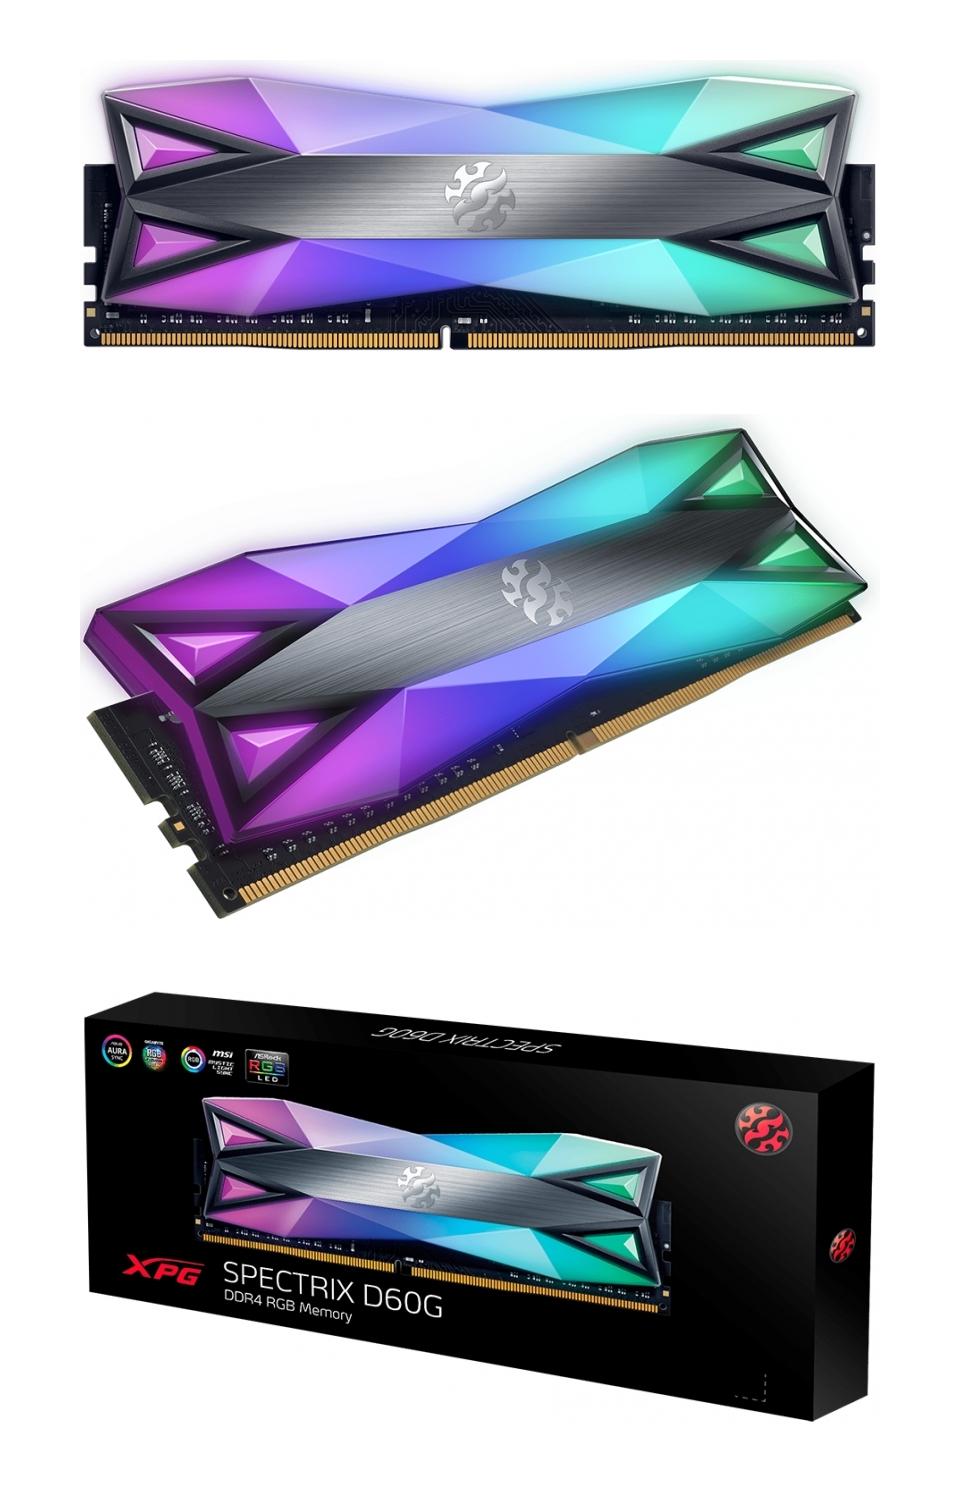 ADATA XPG Spectrix D60G RGB 3200 MHz 16GB (2x8GB) DDR4 Grey product